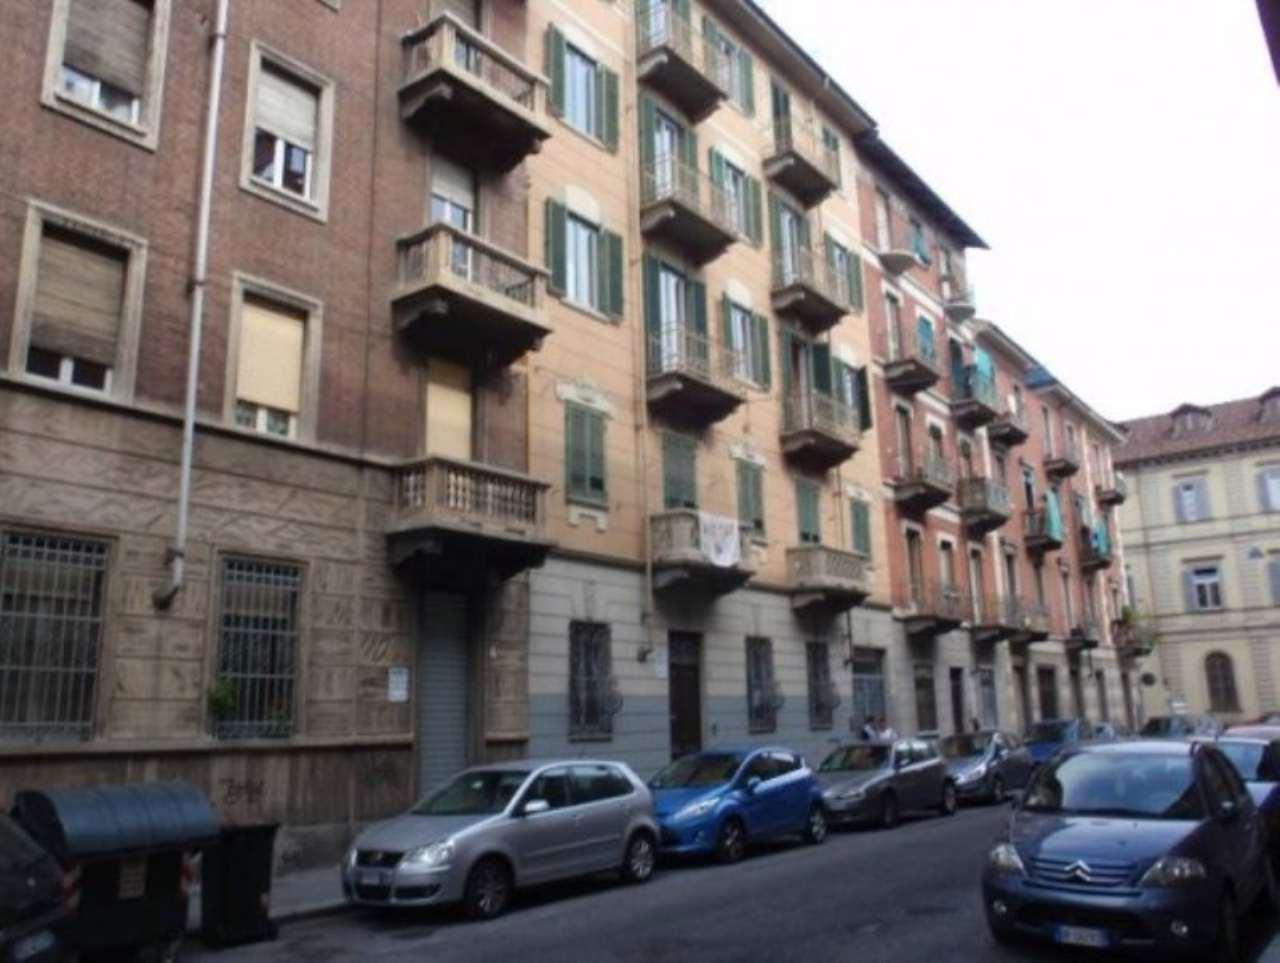 Bilocale Torino Zona Valdocco / Via Brindisi, 15 6